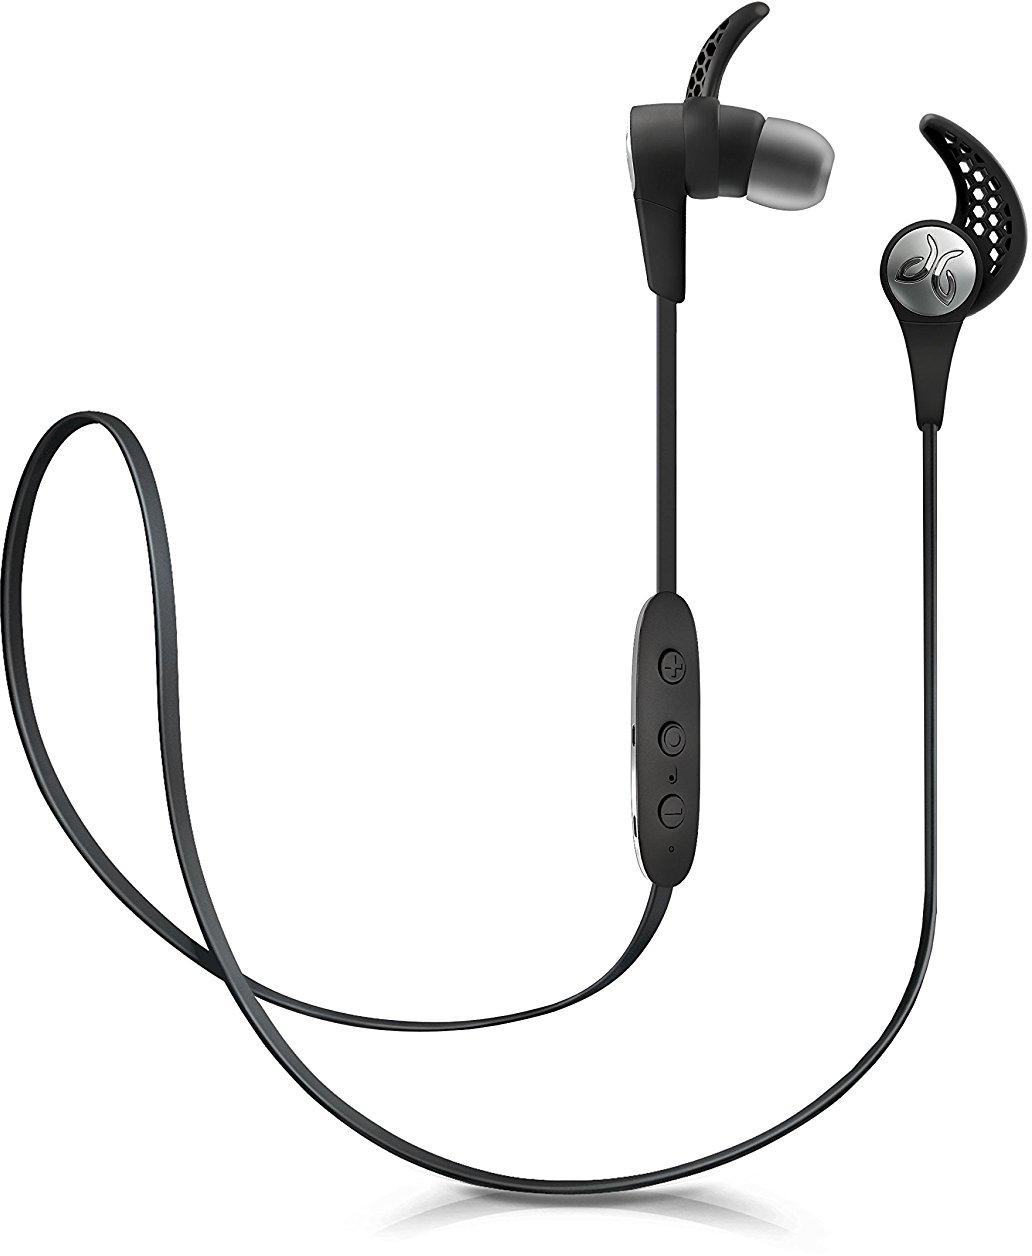 Bluetooth-наушники Jaybird X3 (985-000598) с микрофоном (Black)